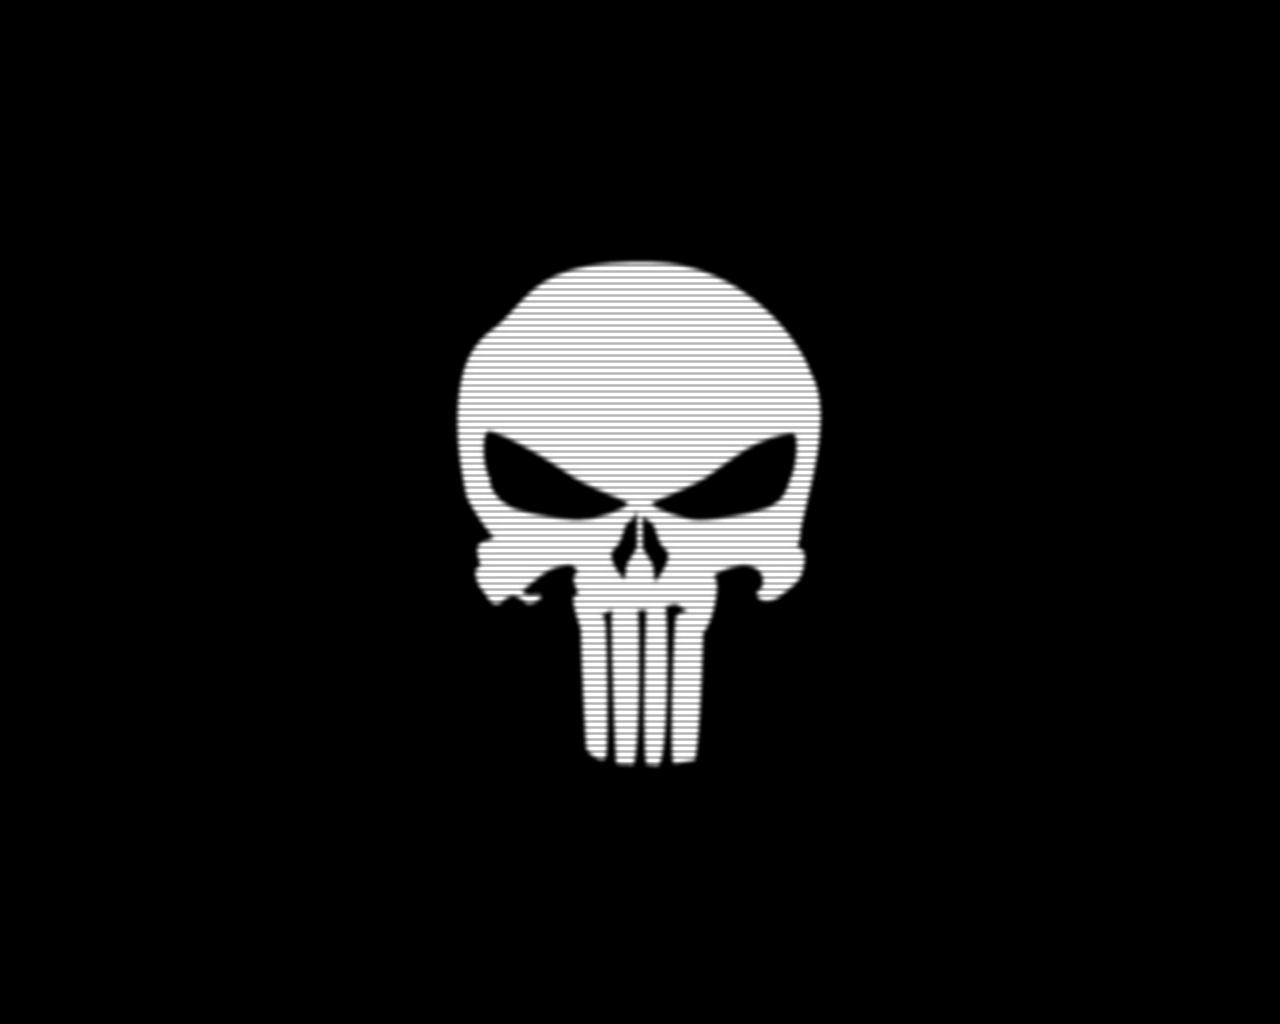 Para otros usos de este t233rmino v233ase Punisher  : ThePunisherbyNoMoS <strong>Xbox</strong> Chair from datuopinion.com size 1280 x 1024 jpeg 64kB